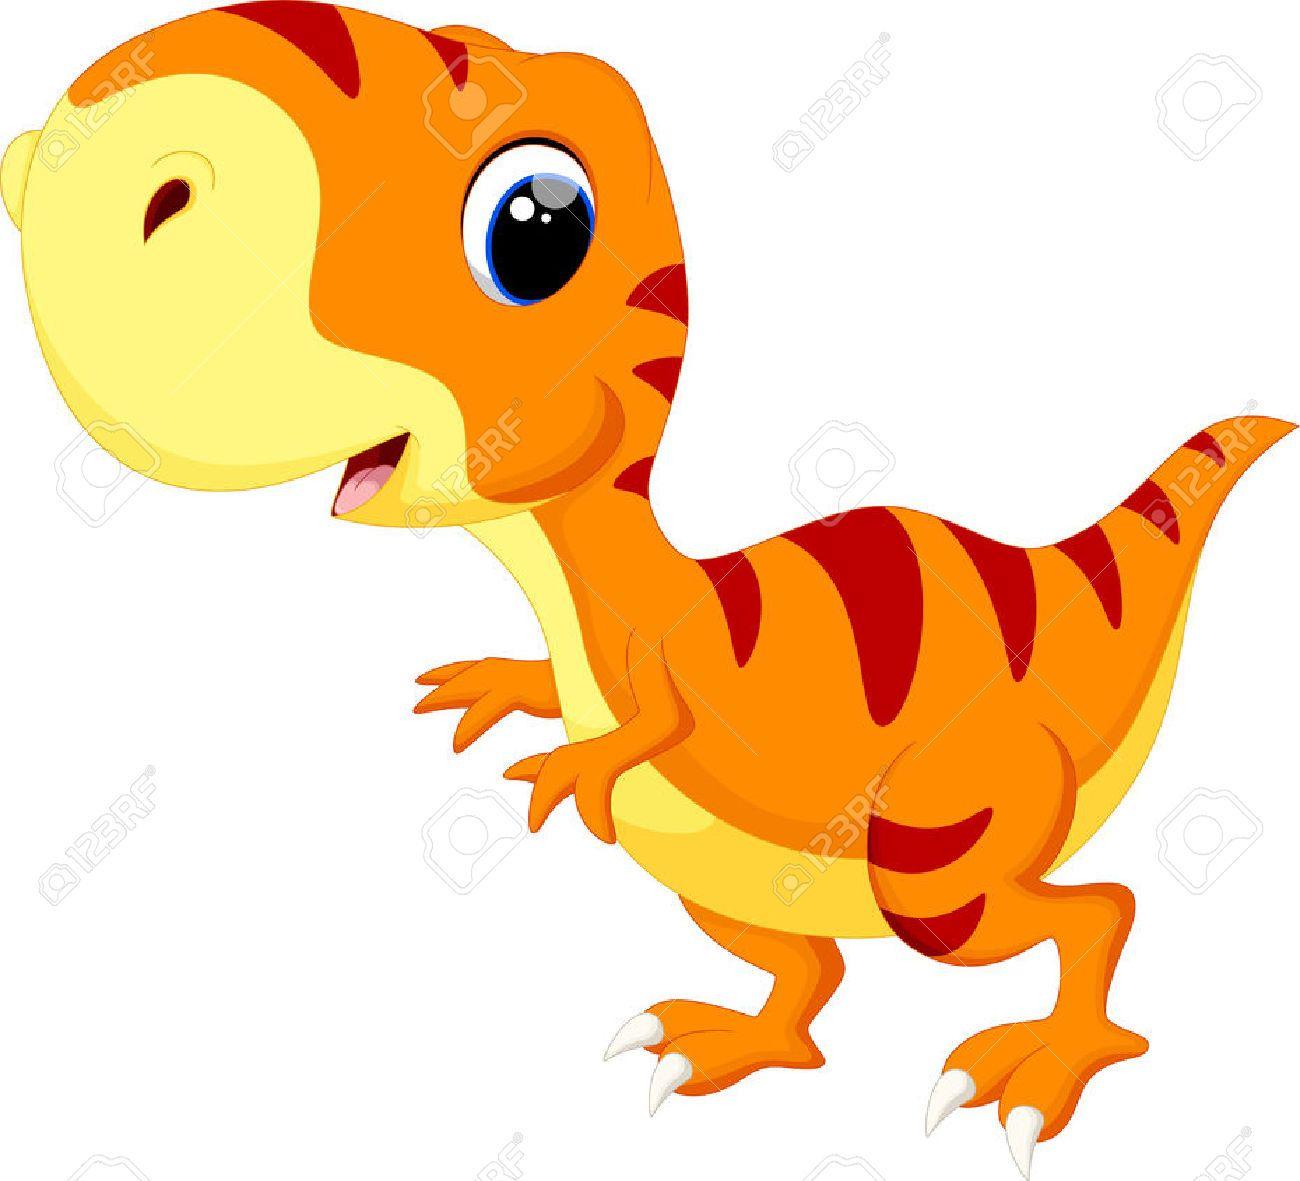 Pin De Gimena En Ilustración Digital Dinosaurio Rex Dibujo Dibujo